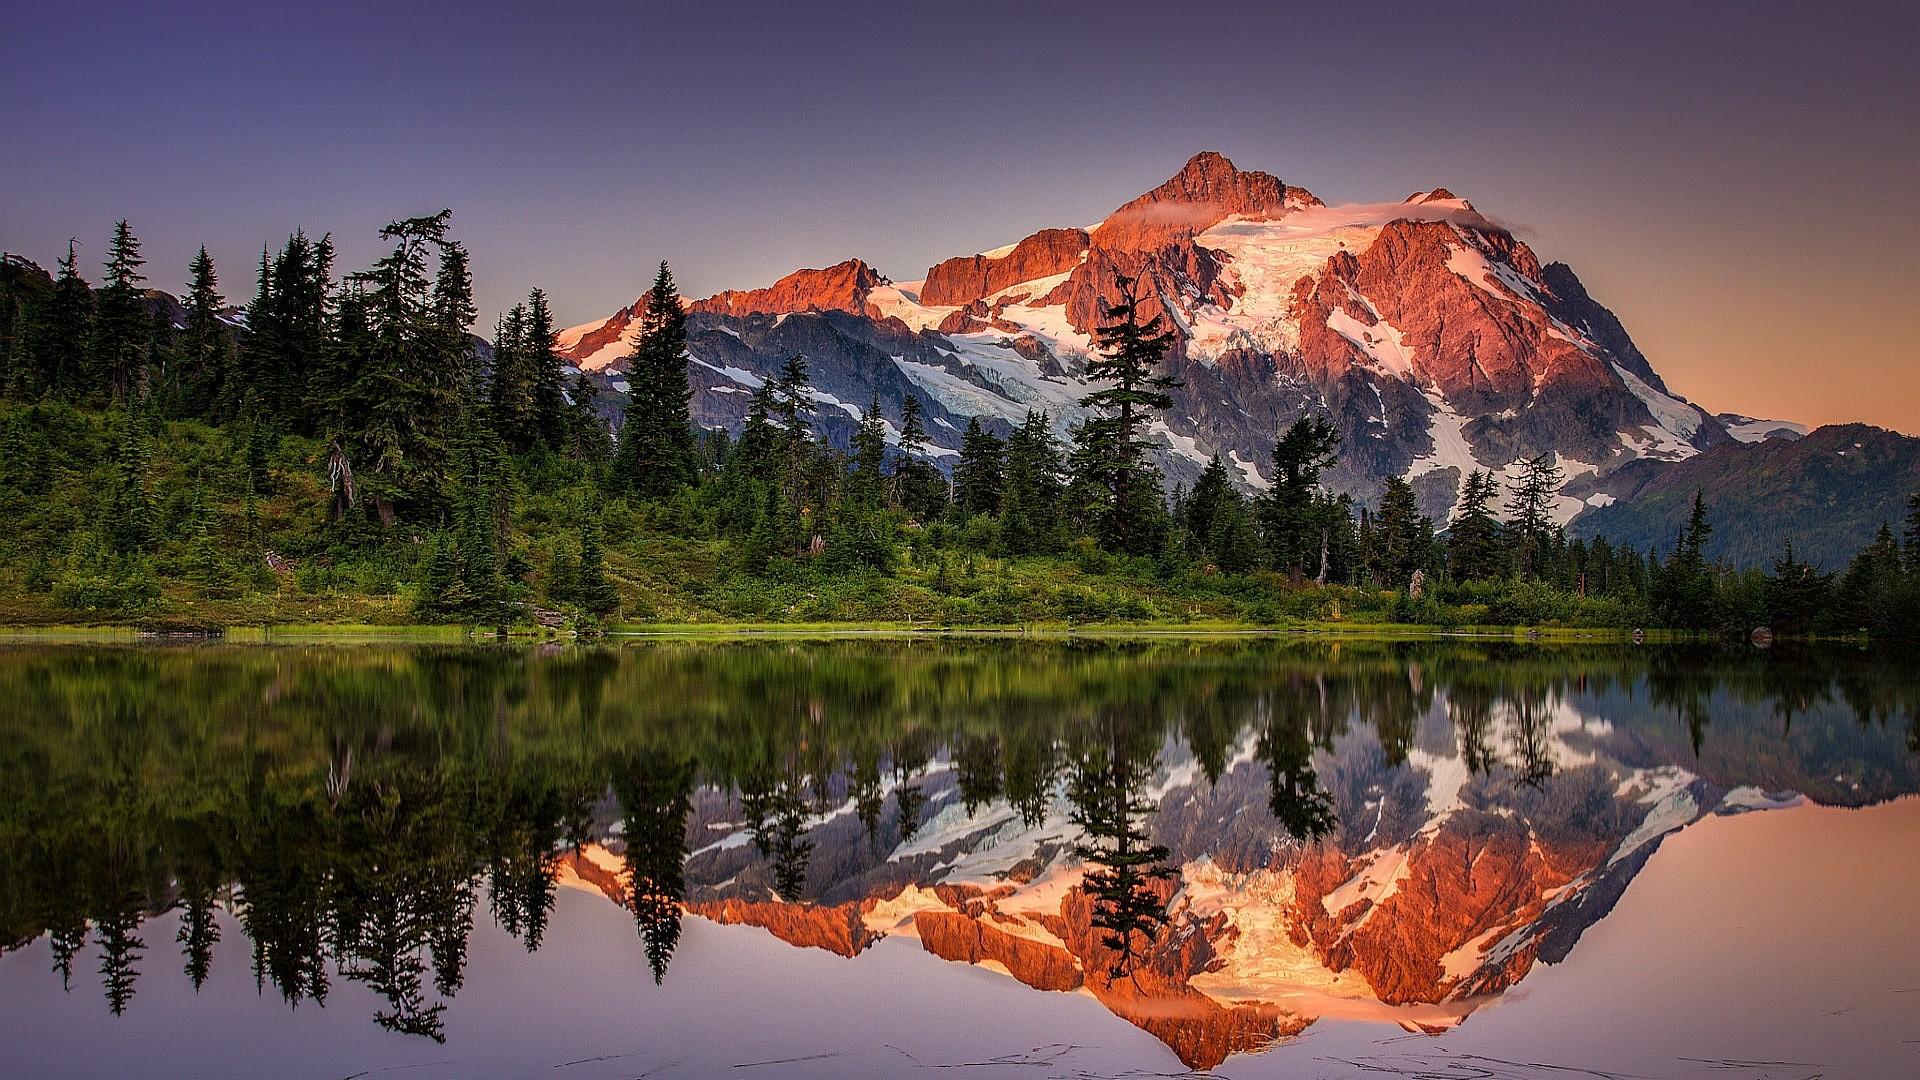 Download Cool Mountain Wallpaper – Full HD Wall